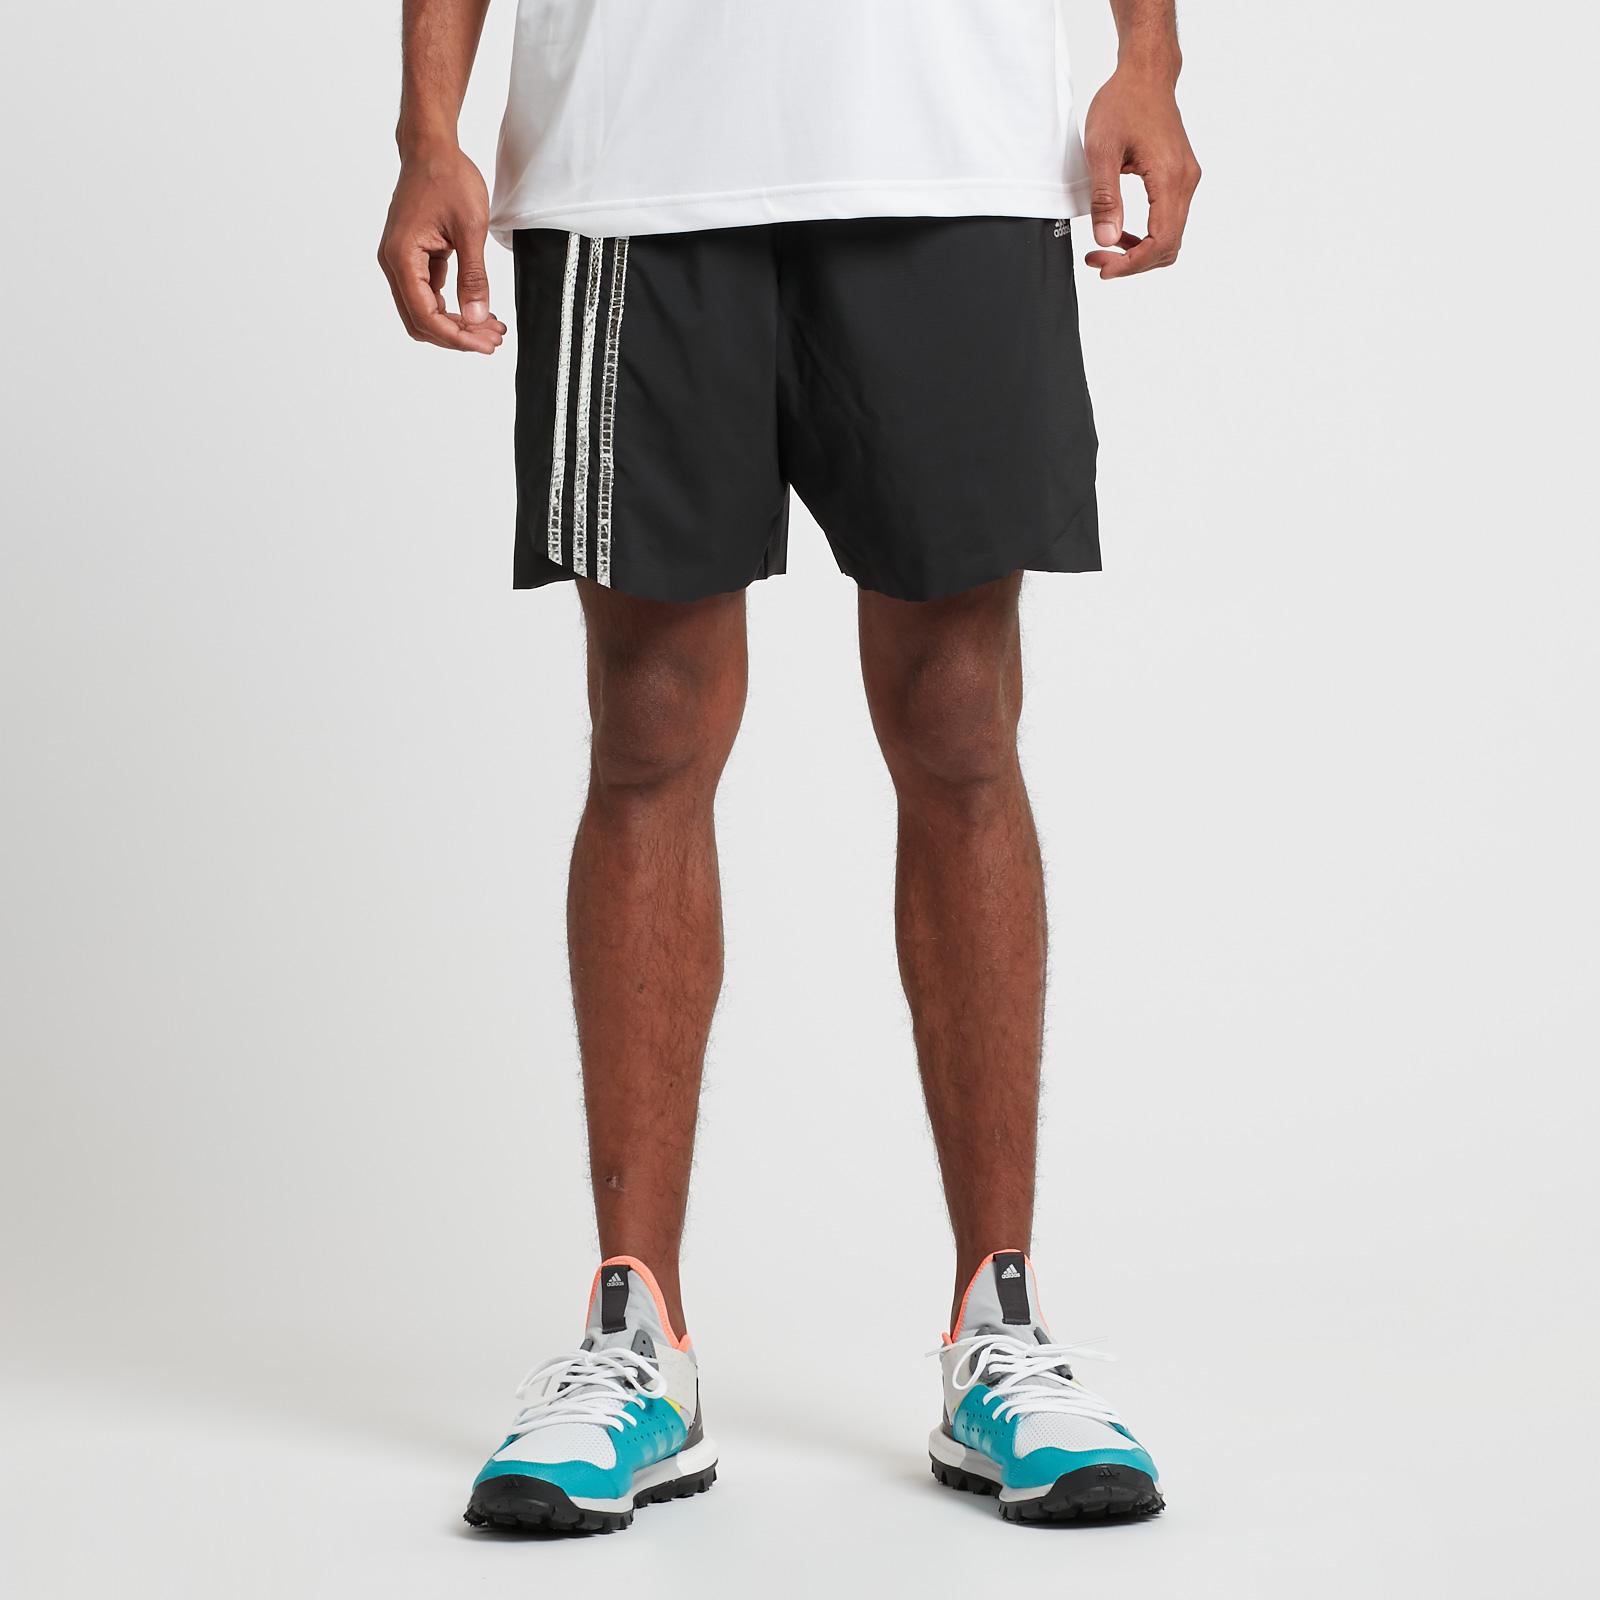 adidas Track Pants Bq0152 Basketsnstuff Baskets streetwear